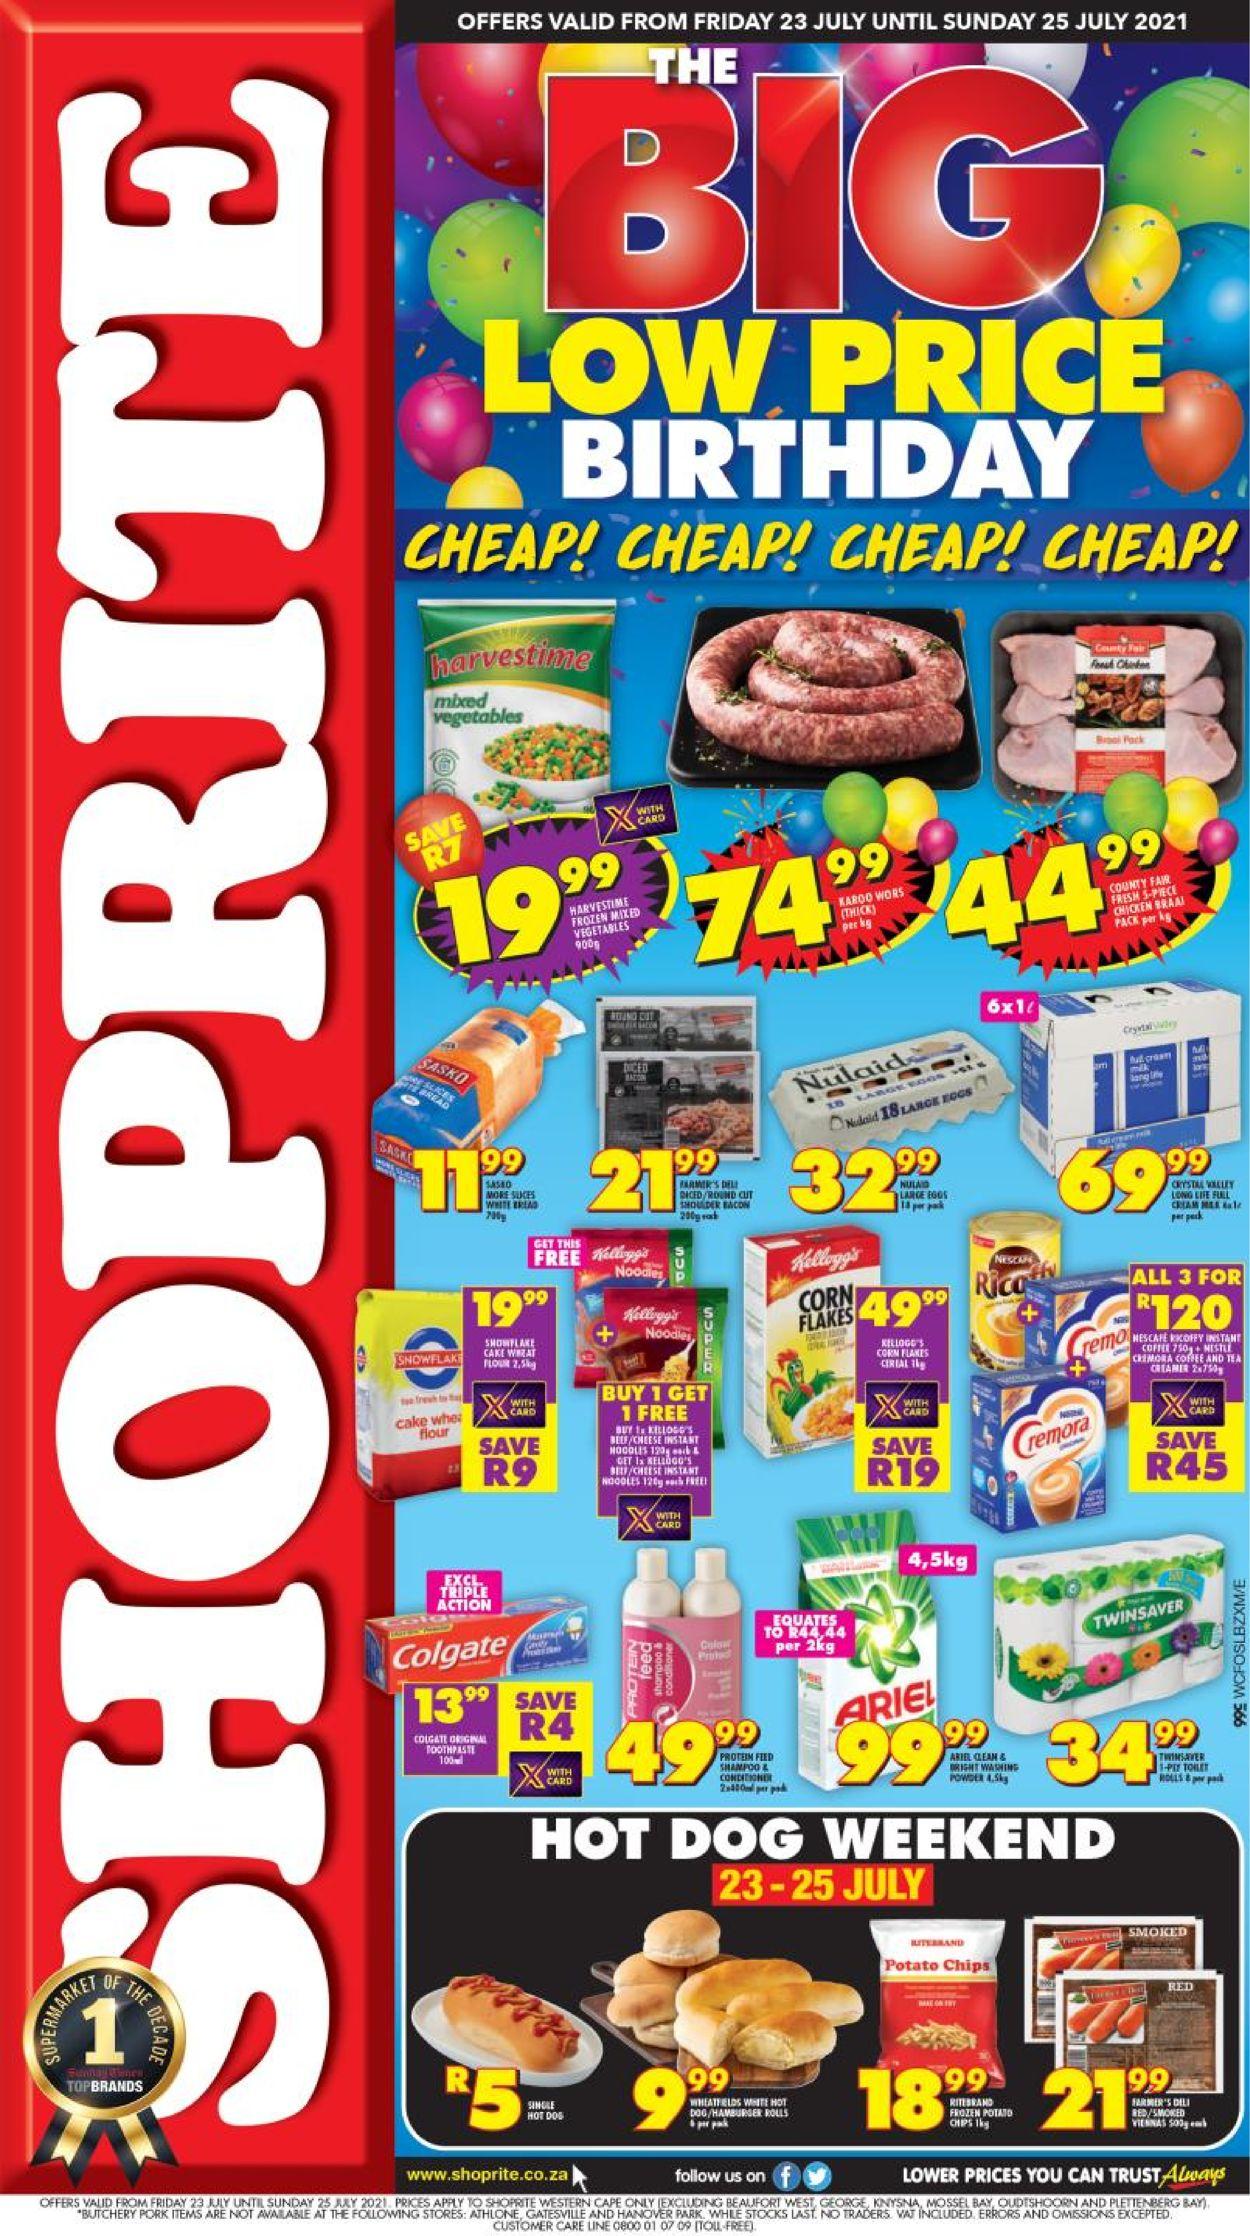 Shoprite Catalogue - 2021/07/23-2021/07/25